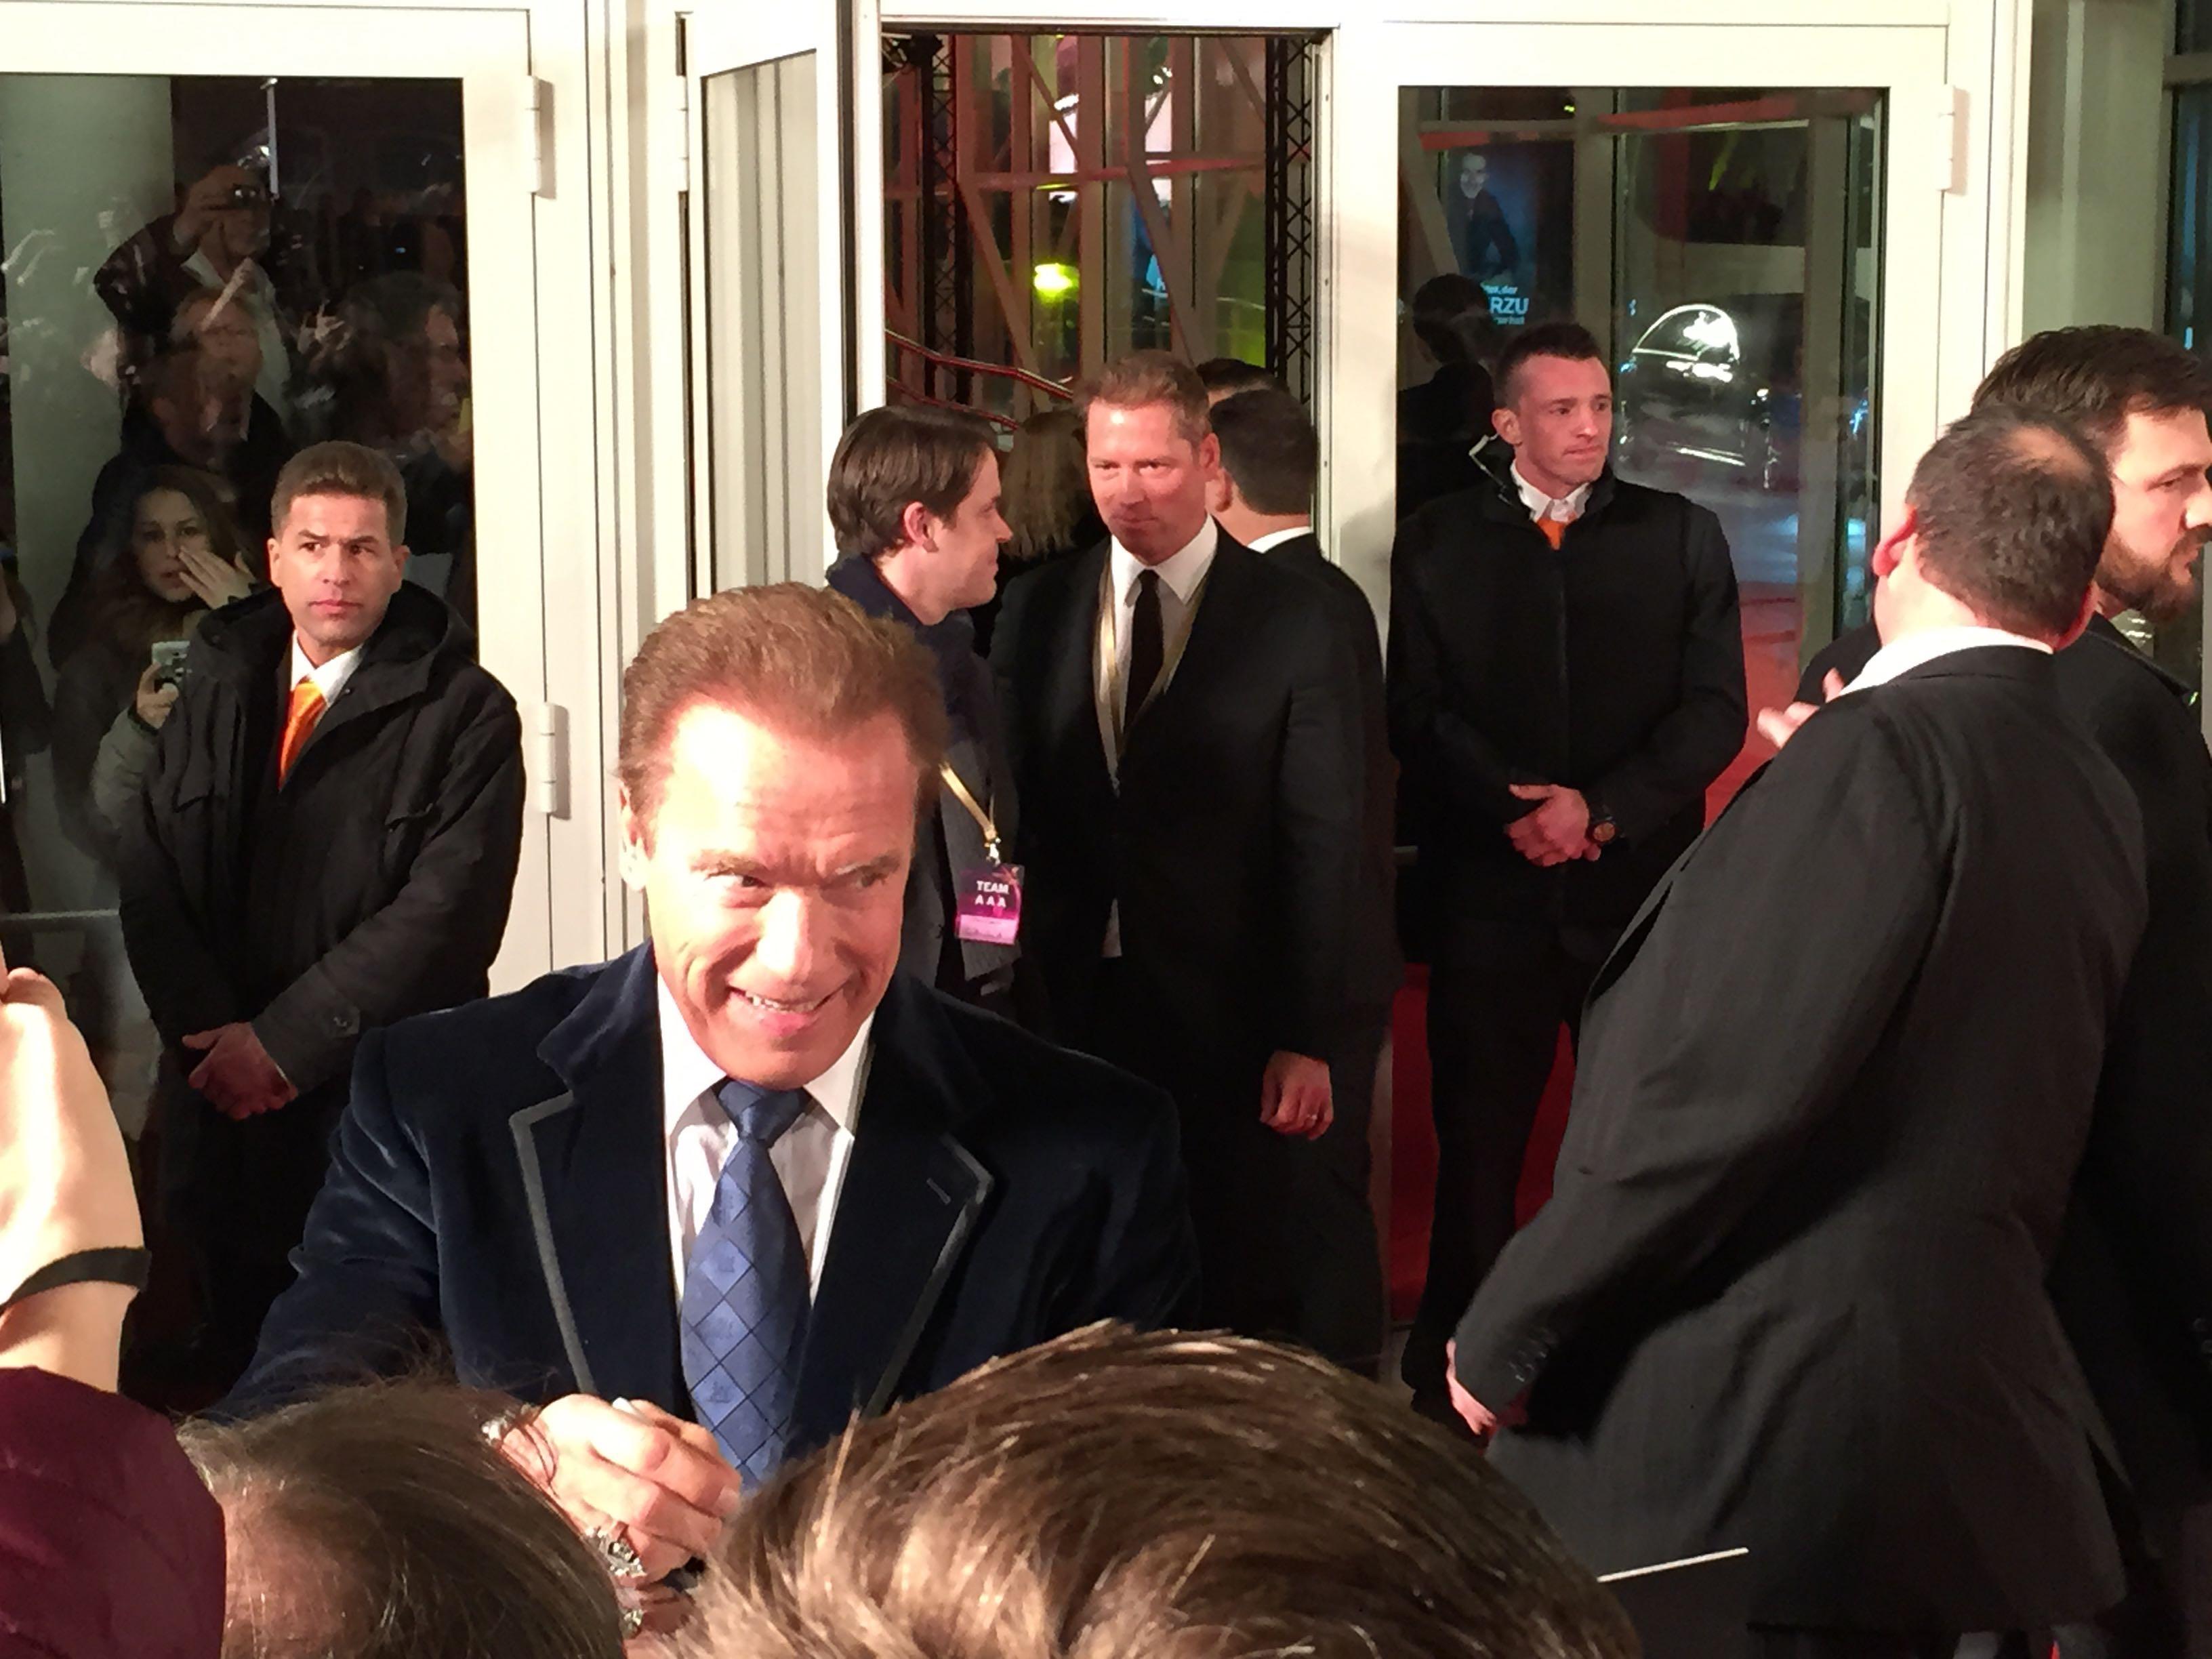 Arnold Schwarzenegger, Goldene Kamera, Hamburg Sightseeing